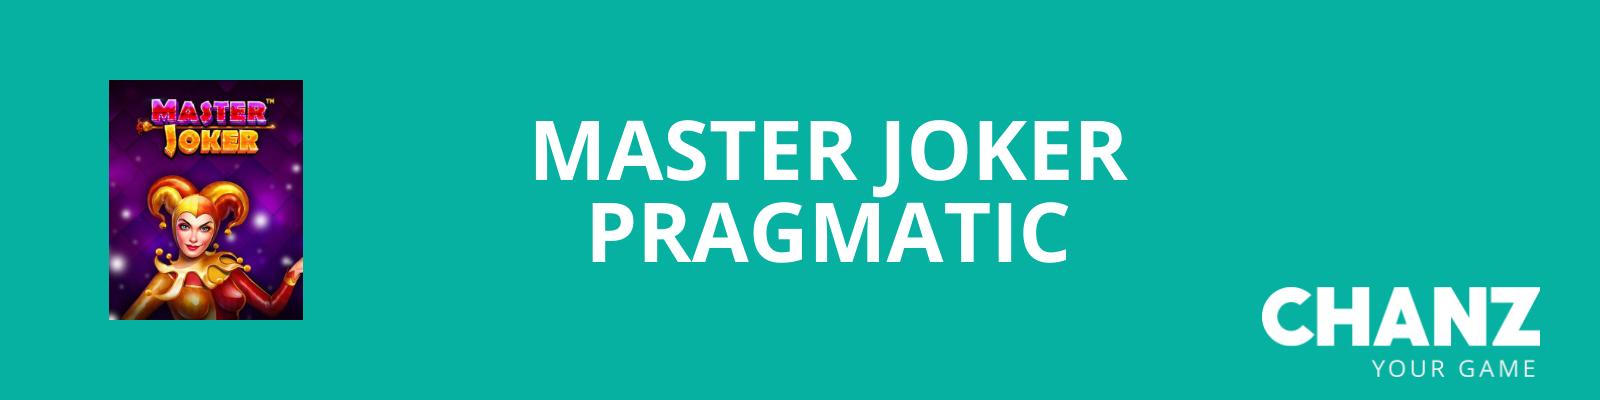 Master Joker Pragmatic Play Chanz